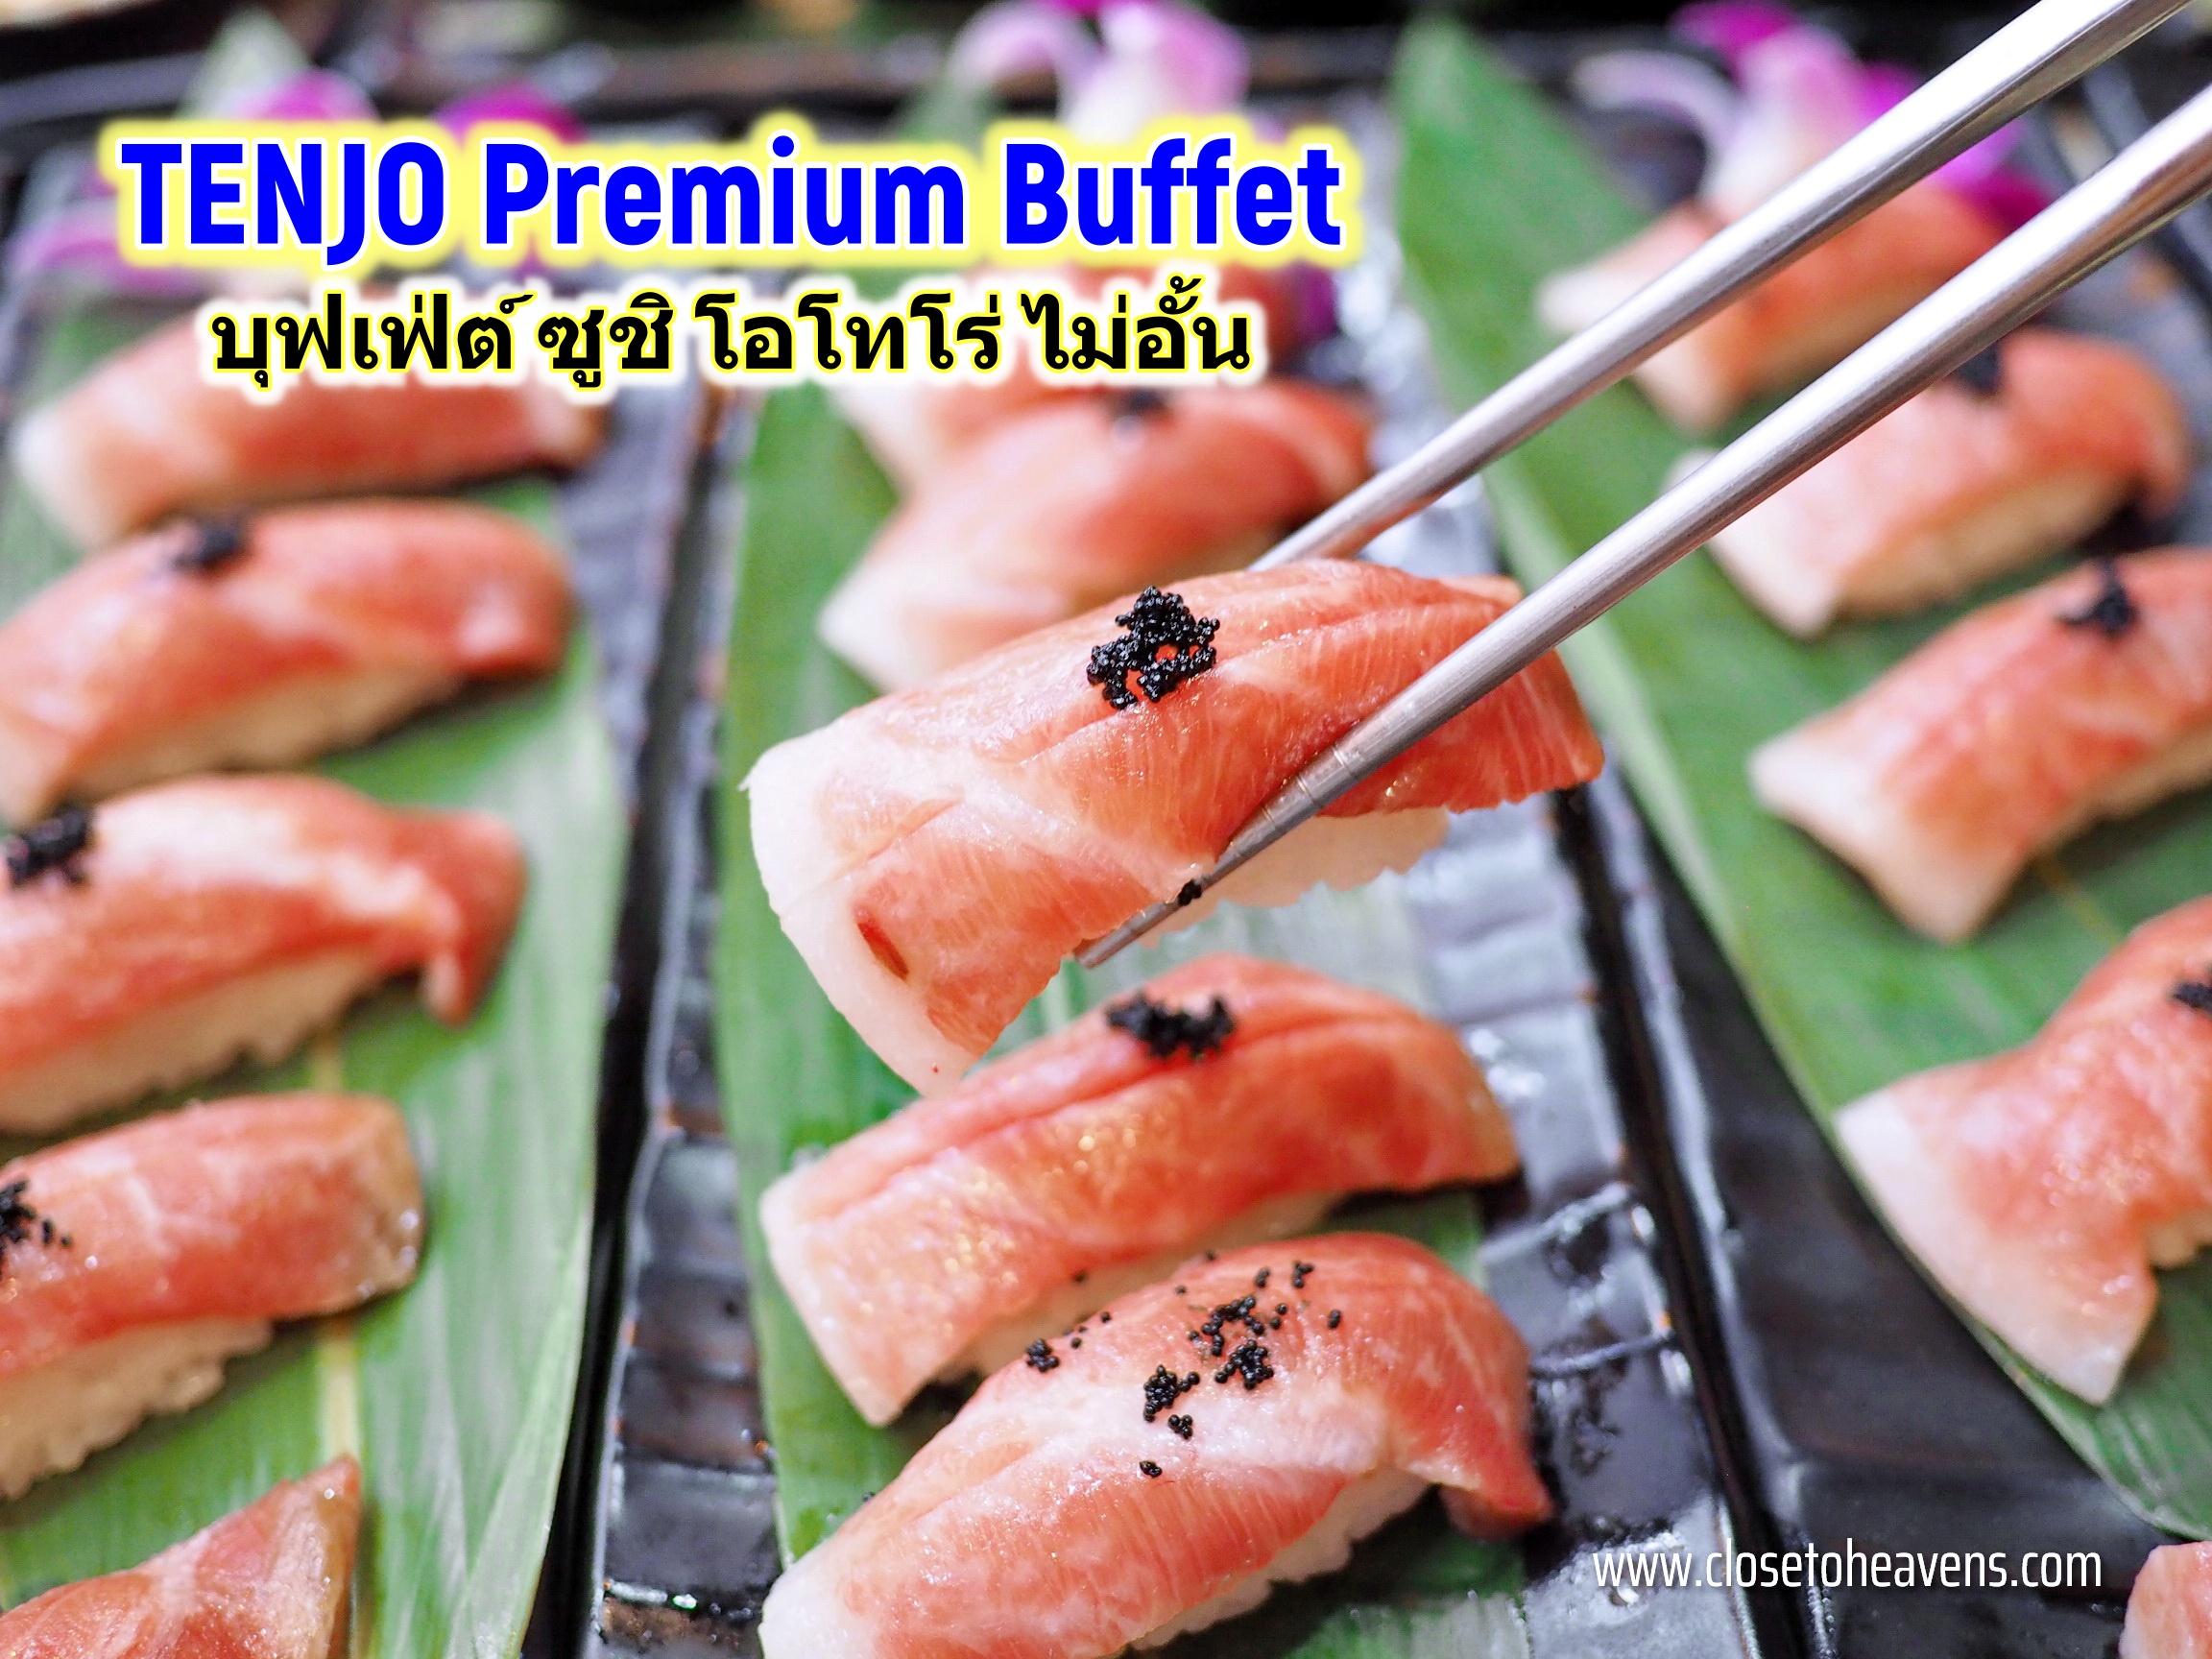 Tenjo Sushi & Yakiniku Premium Buffet